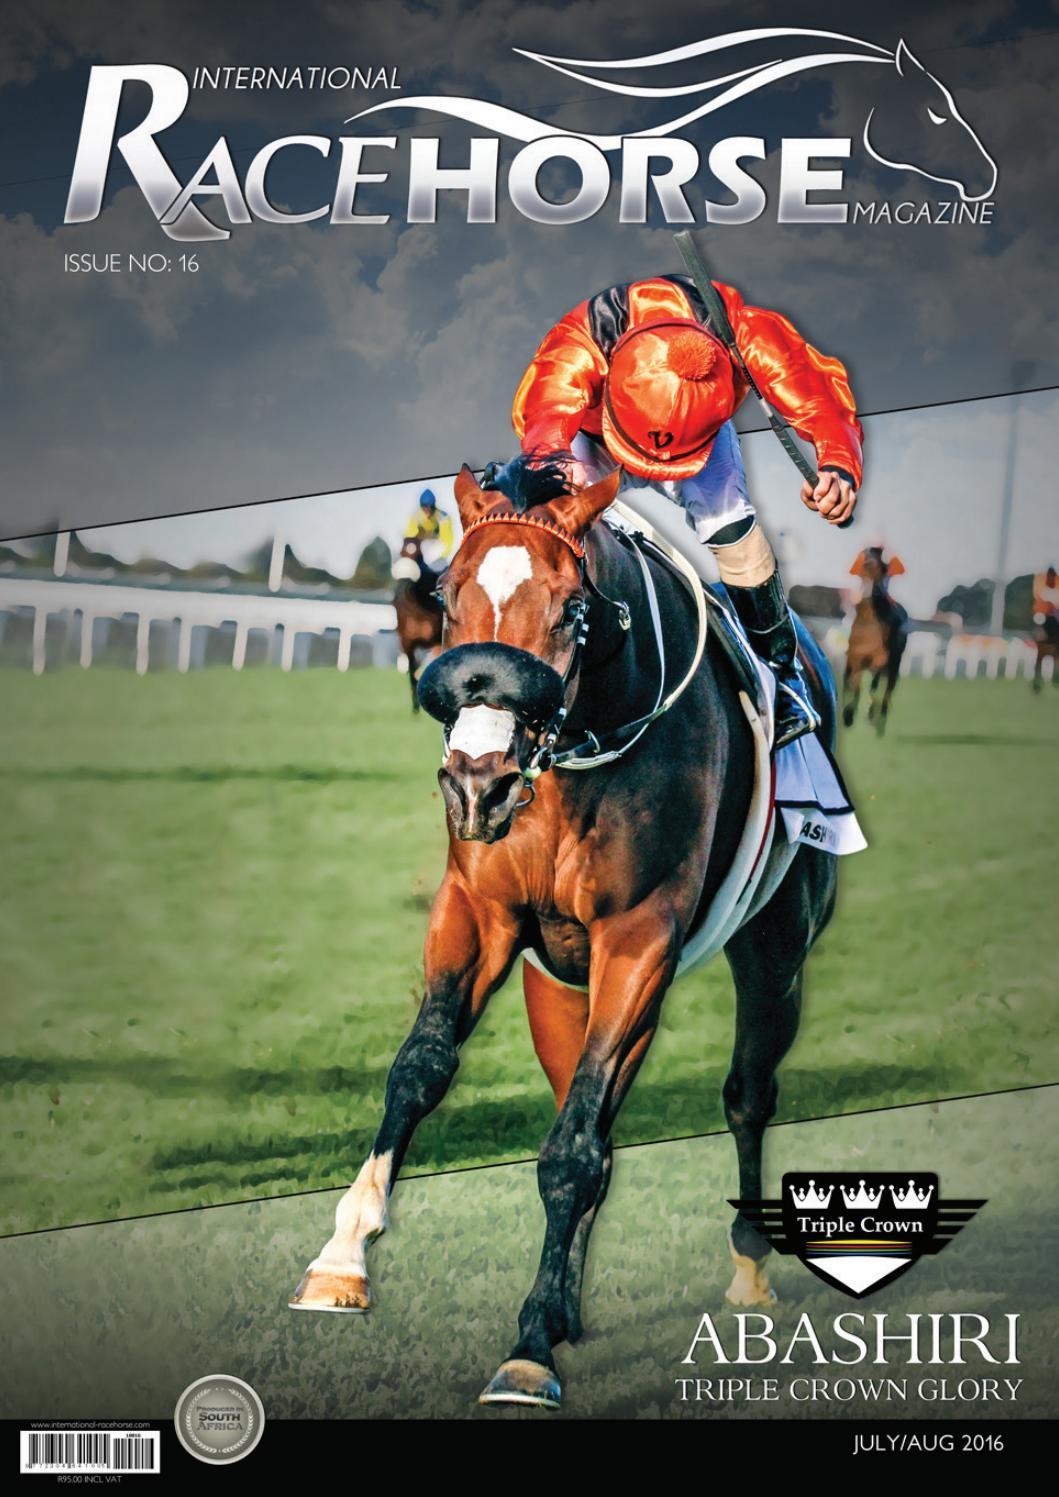 2-Unicorn Million Dollar Bills MYTHICAL HORSE-Novelty Money Fake R3